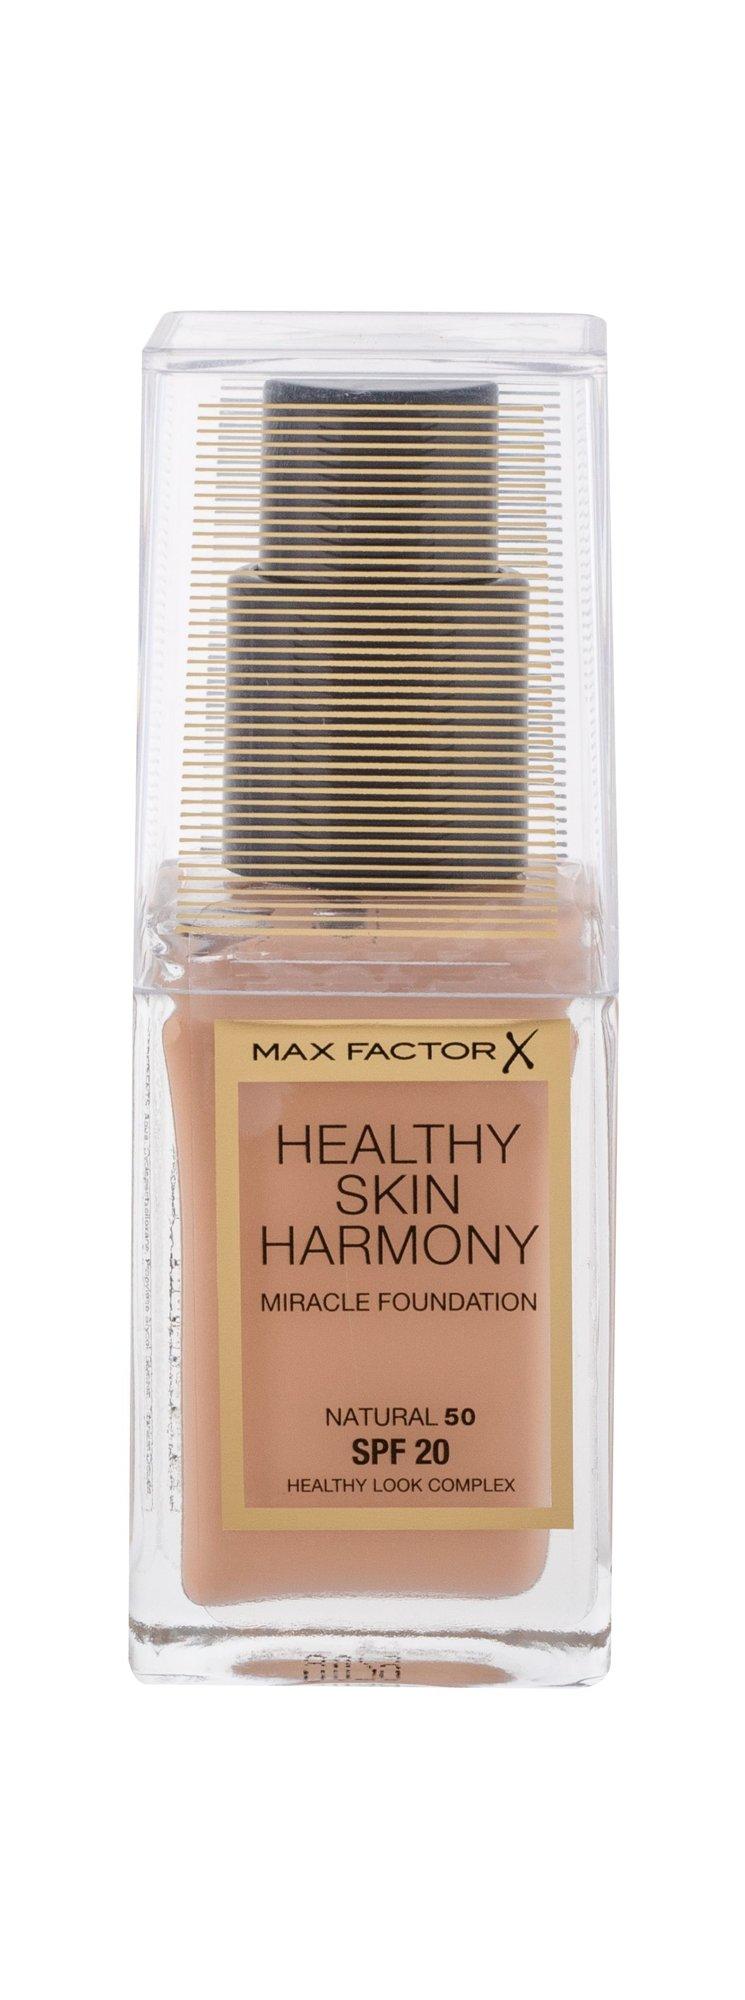 Max Factor Healthy Skin Harmony Makeup 30ml 50 Natural